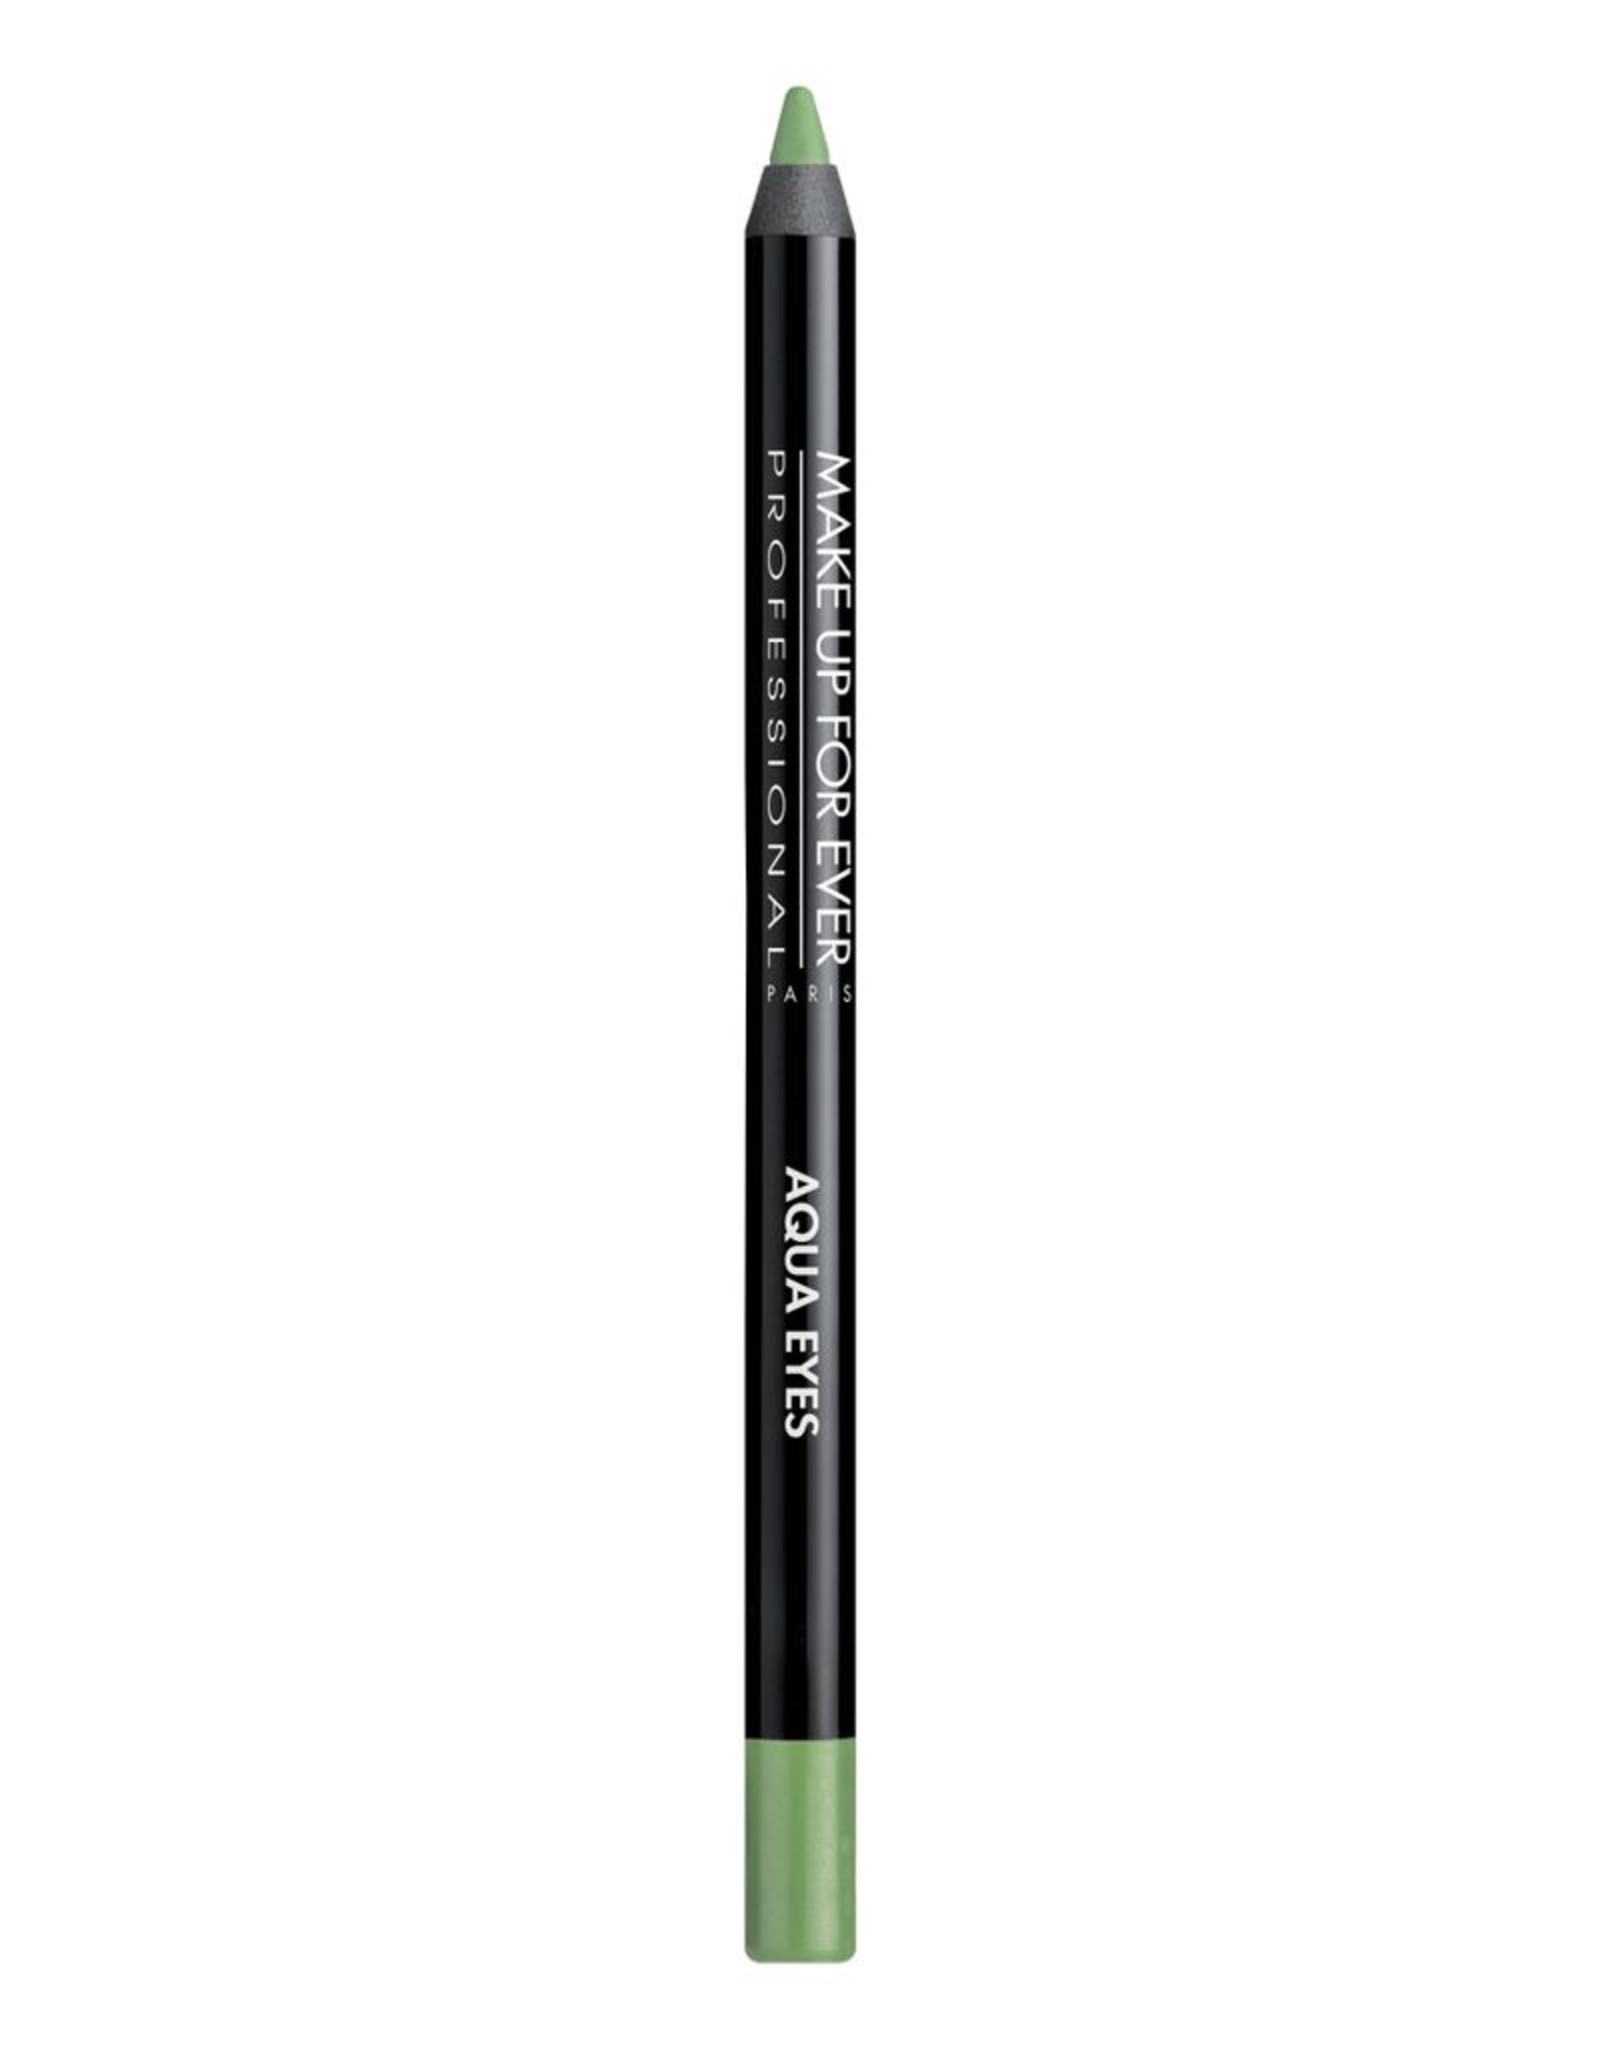 MUFE AQUA EYES CRAYON YEUX WTP NACRE 1,2g 16L vert  /  green